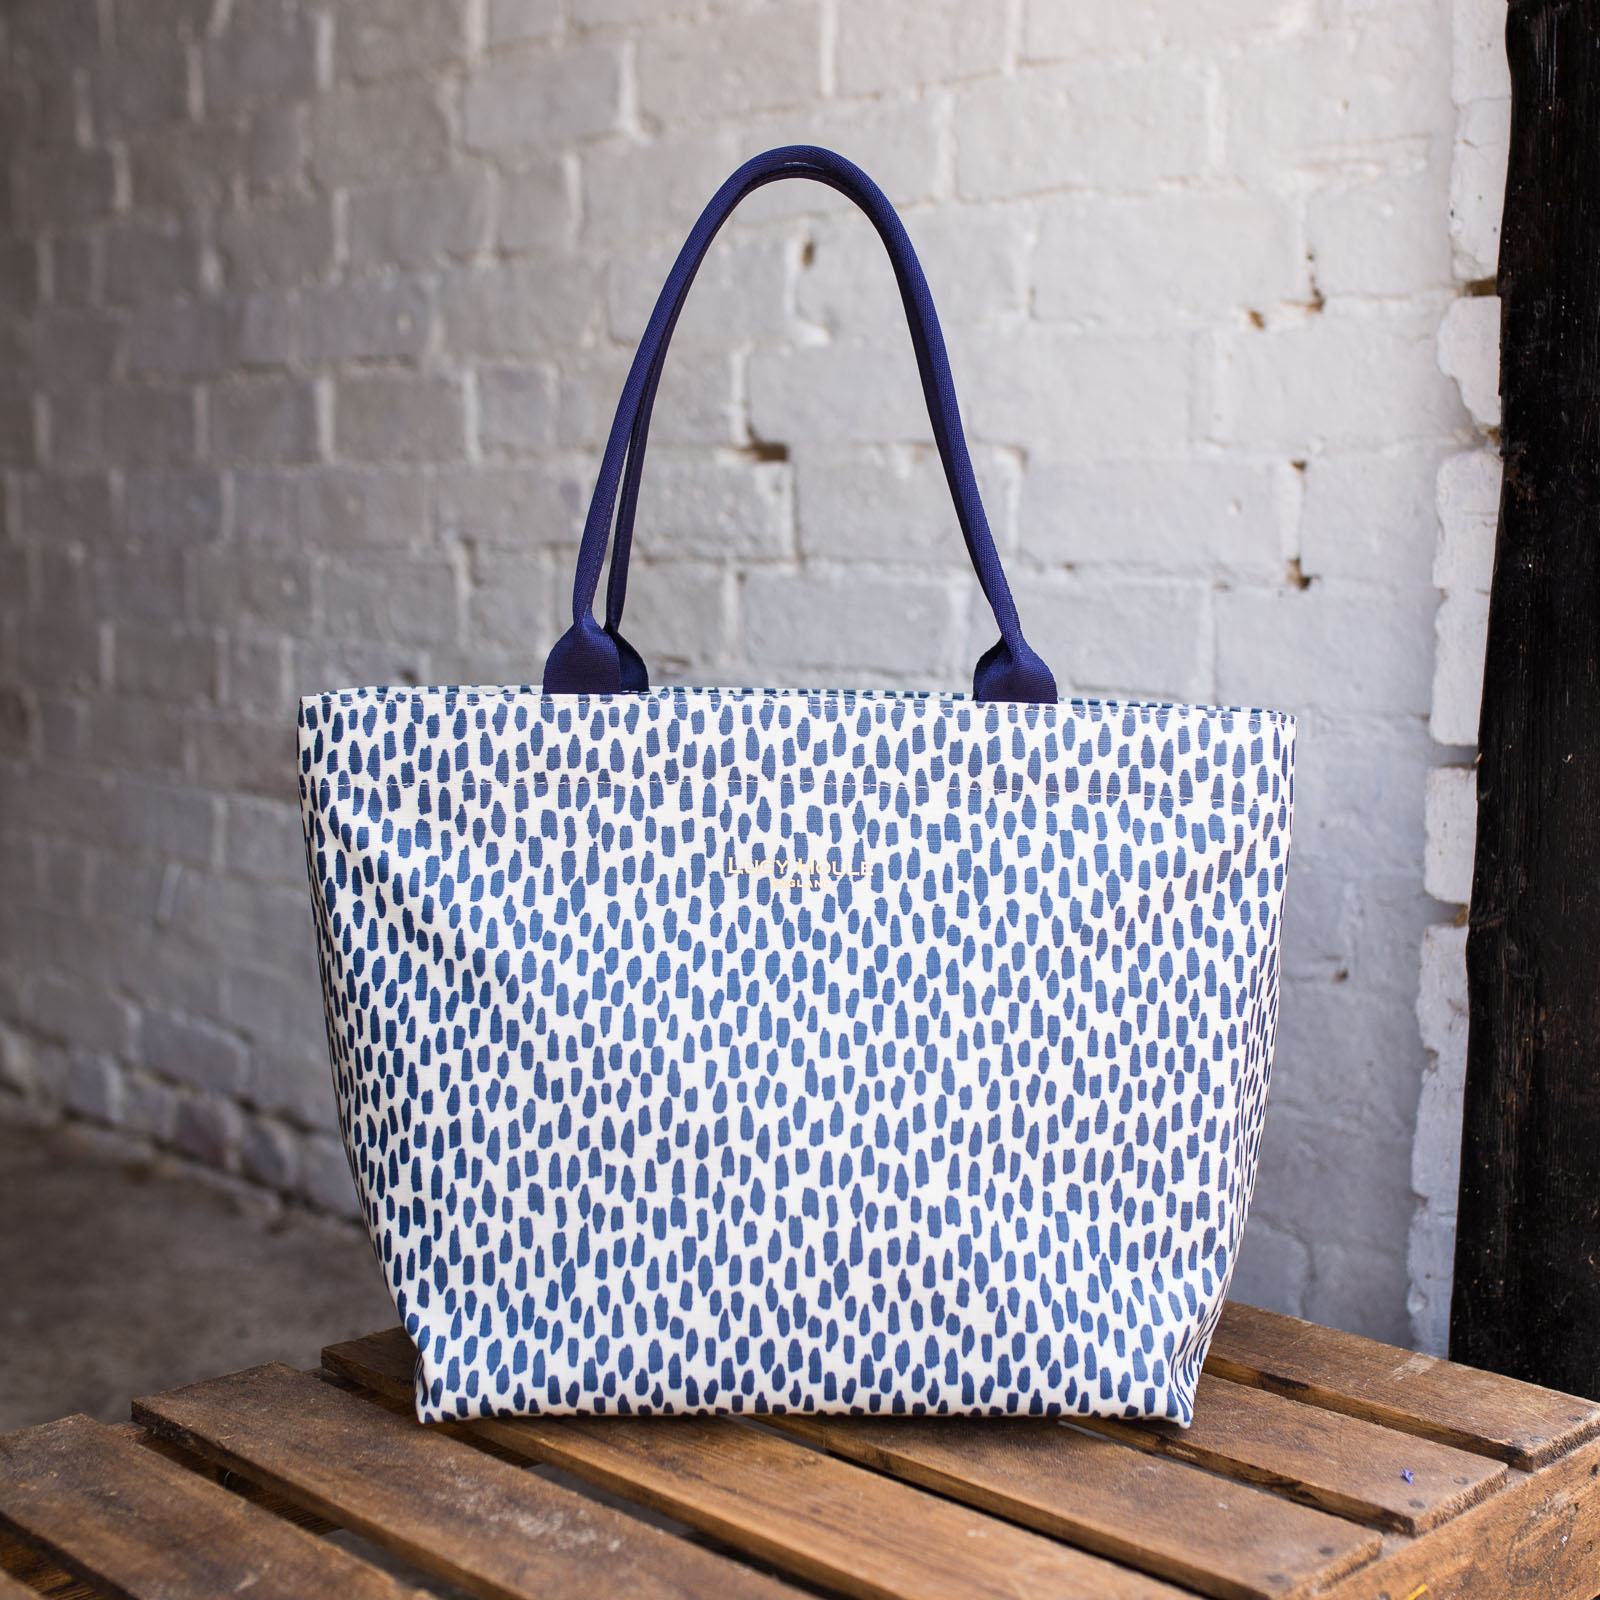 Navy Cobblestone Medium Tote Bag with Navy Handles